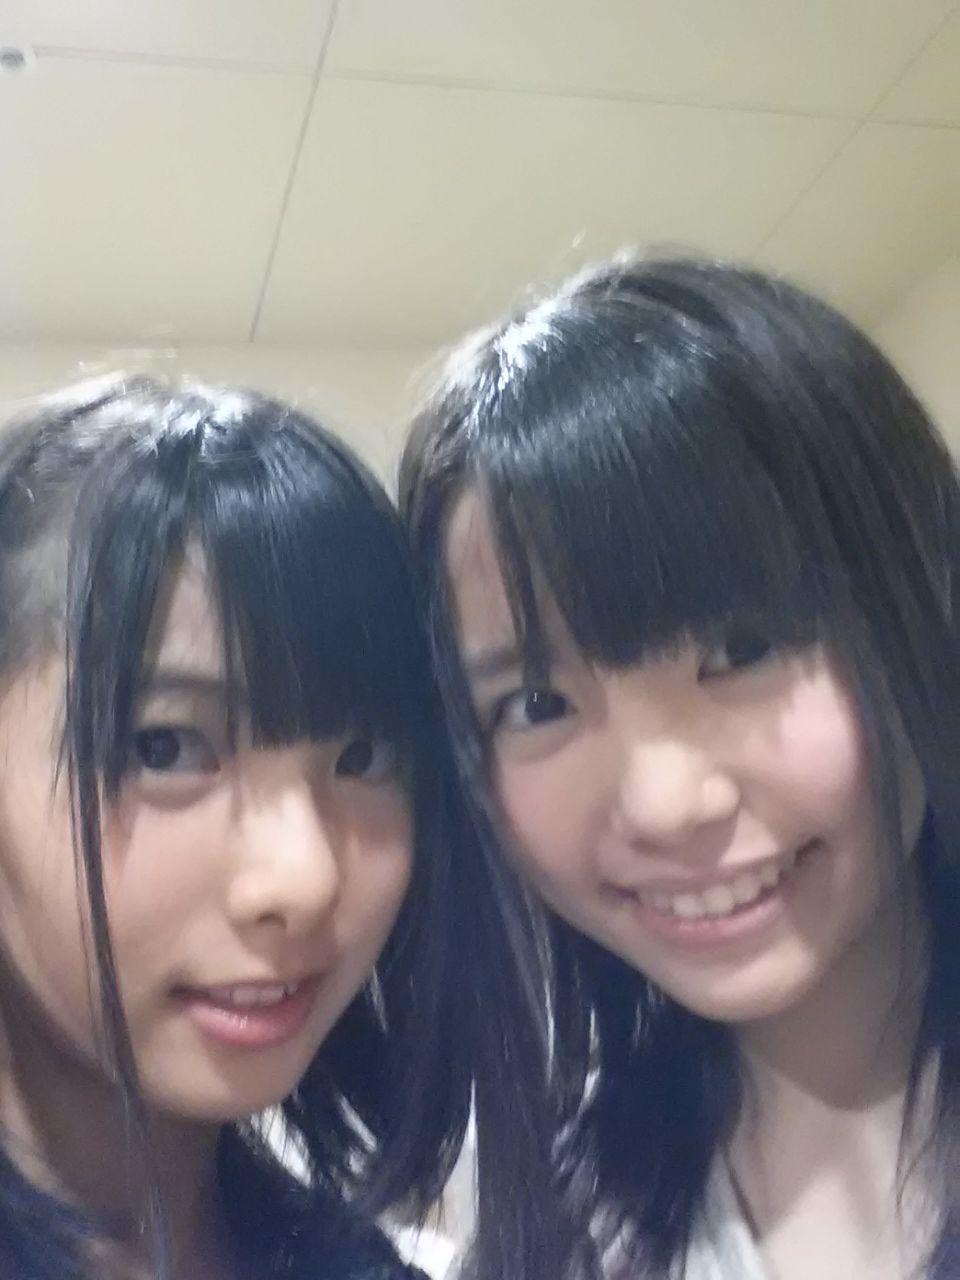 http://livedoor.blogimg.jp/otohaeika/imgs/0/5/05b29951.jpg